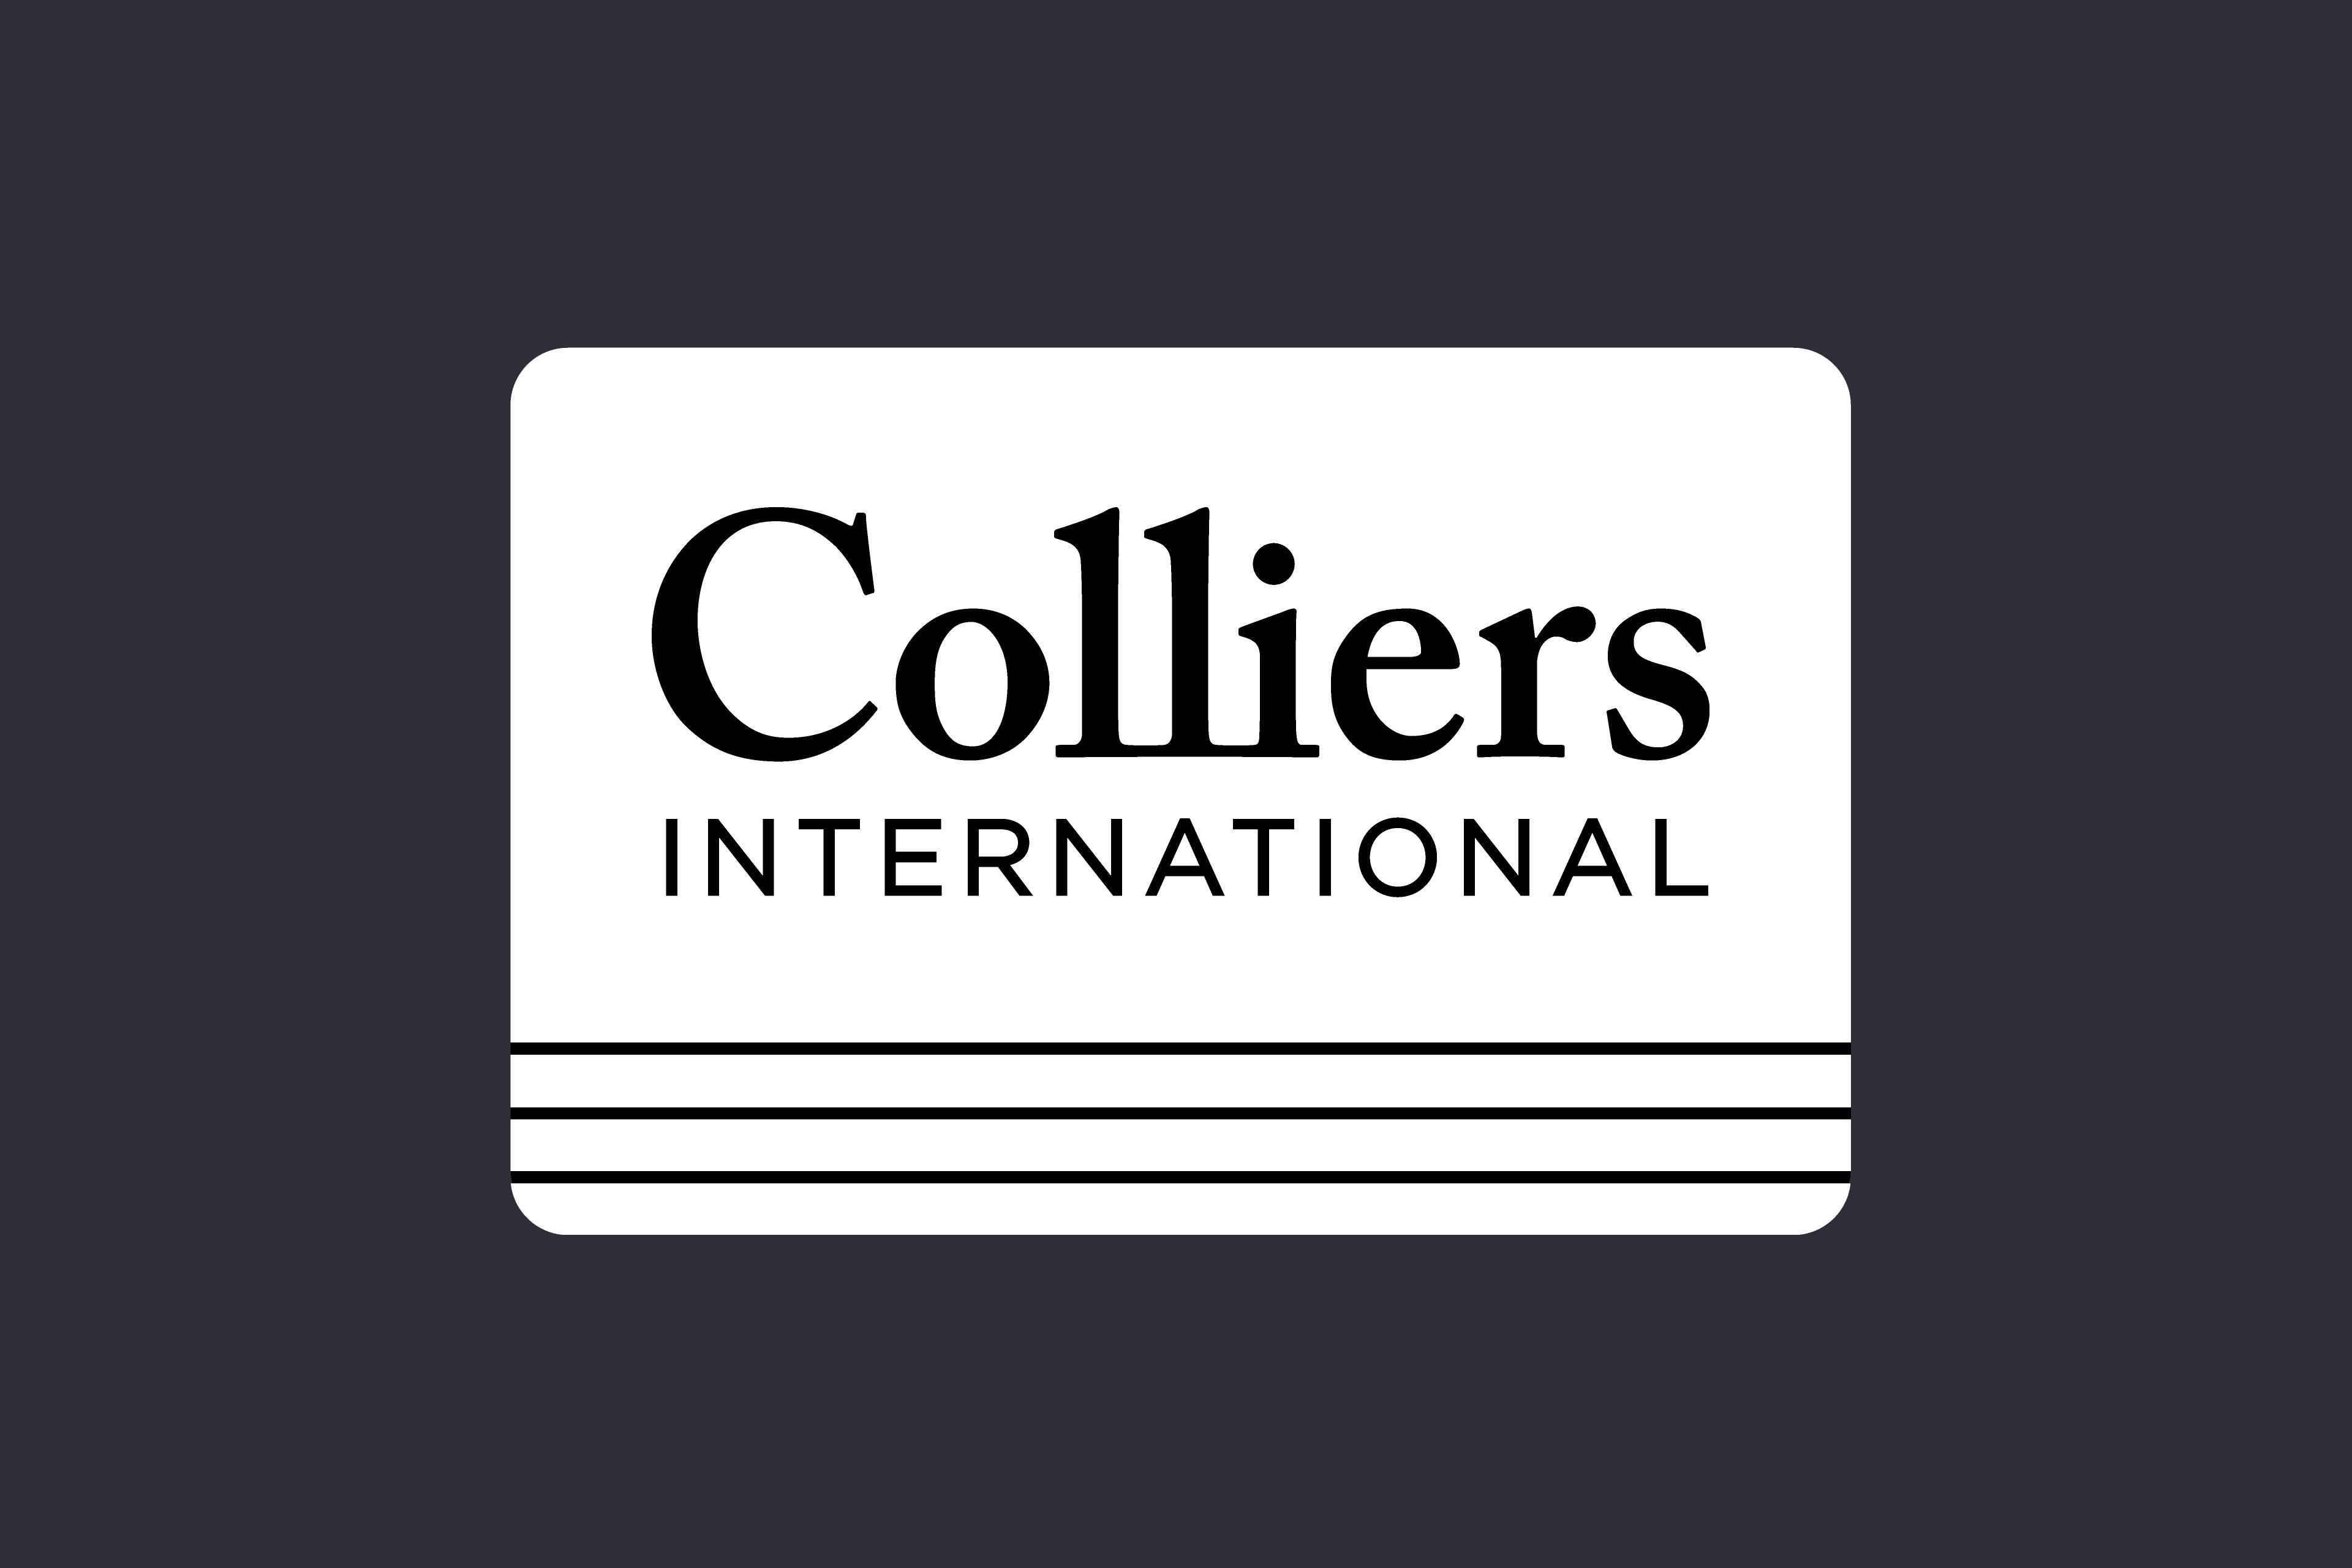 ey-eoy-collier-logo.jpg